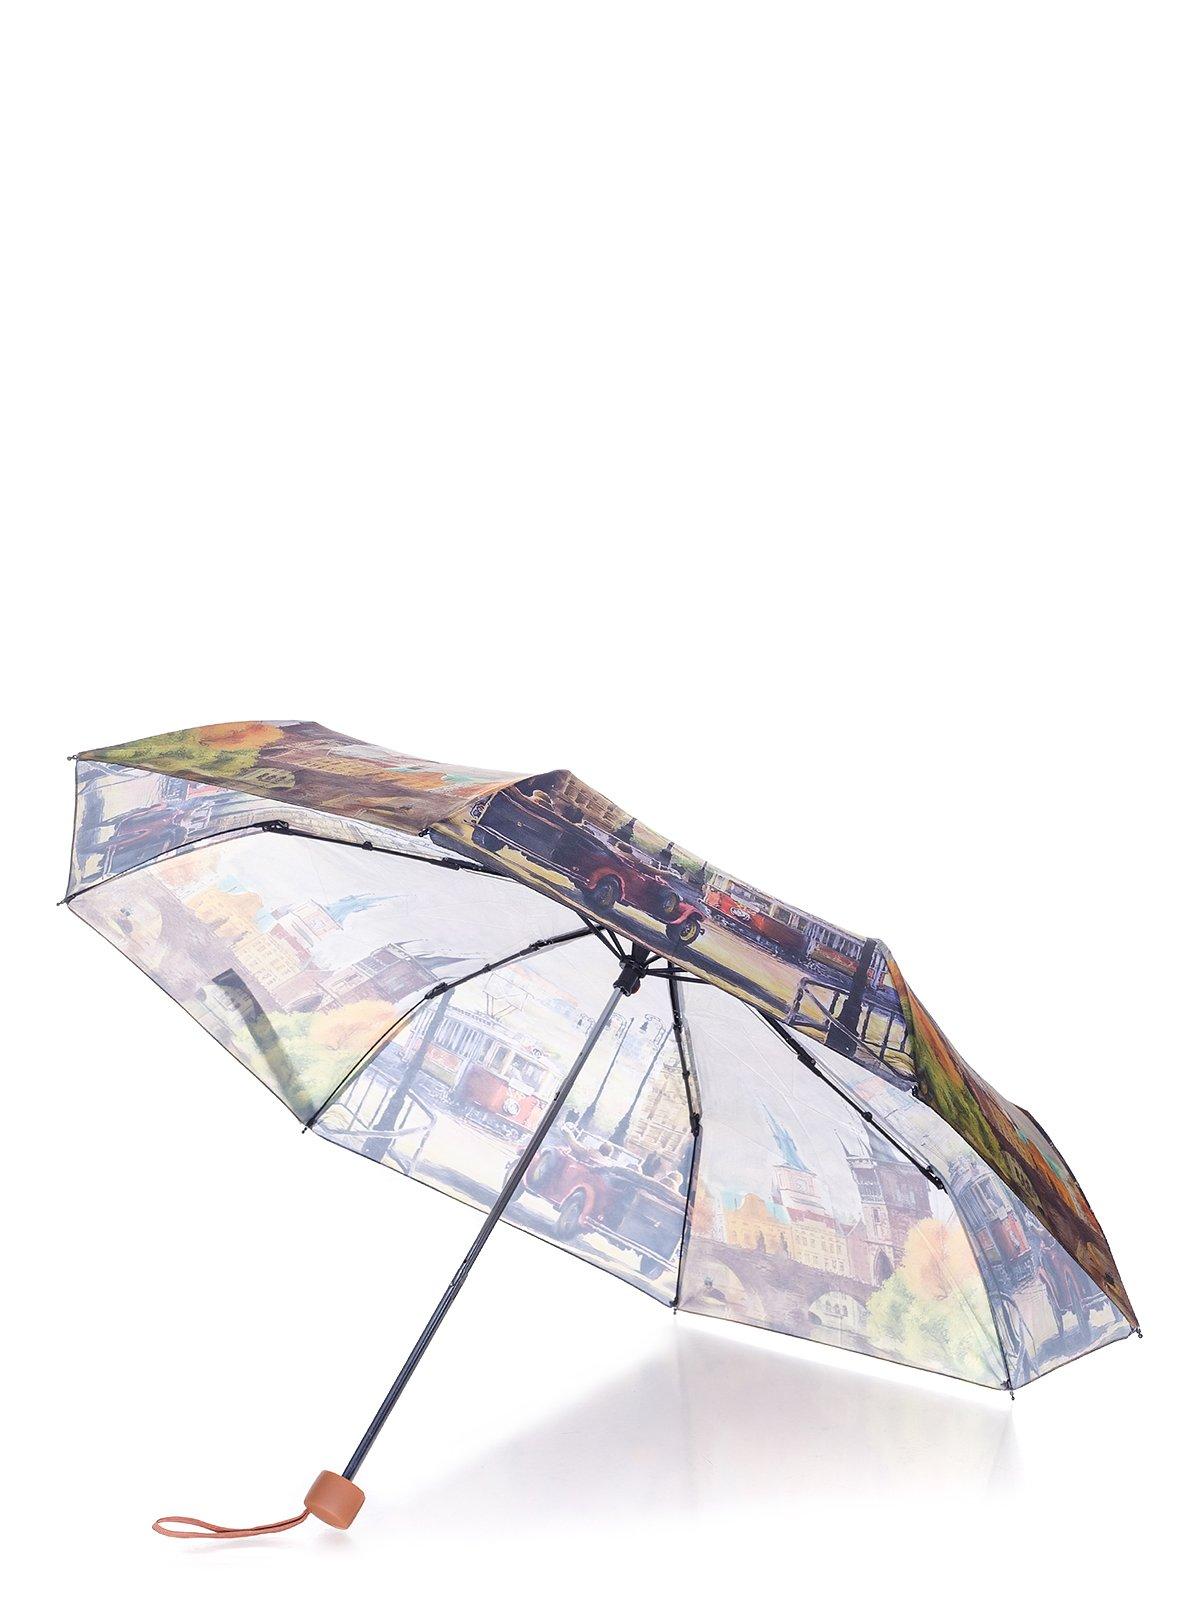 Зонт | 3754574 | фото 2